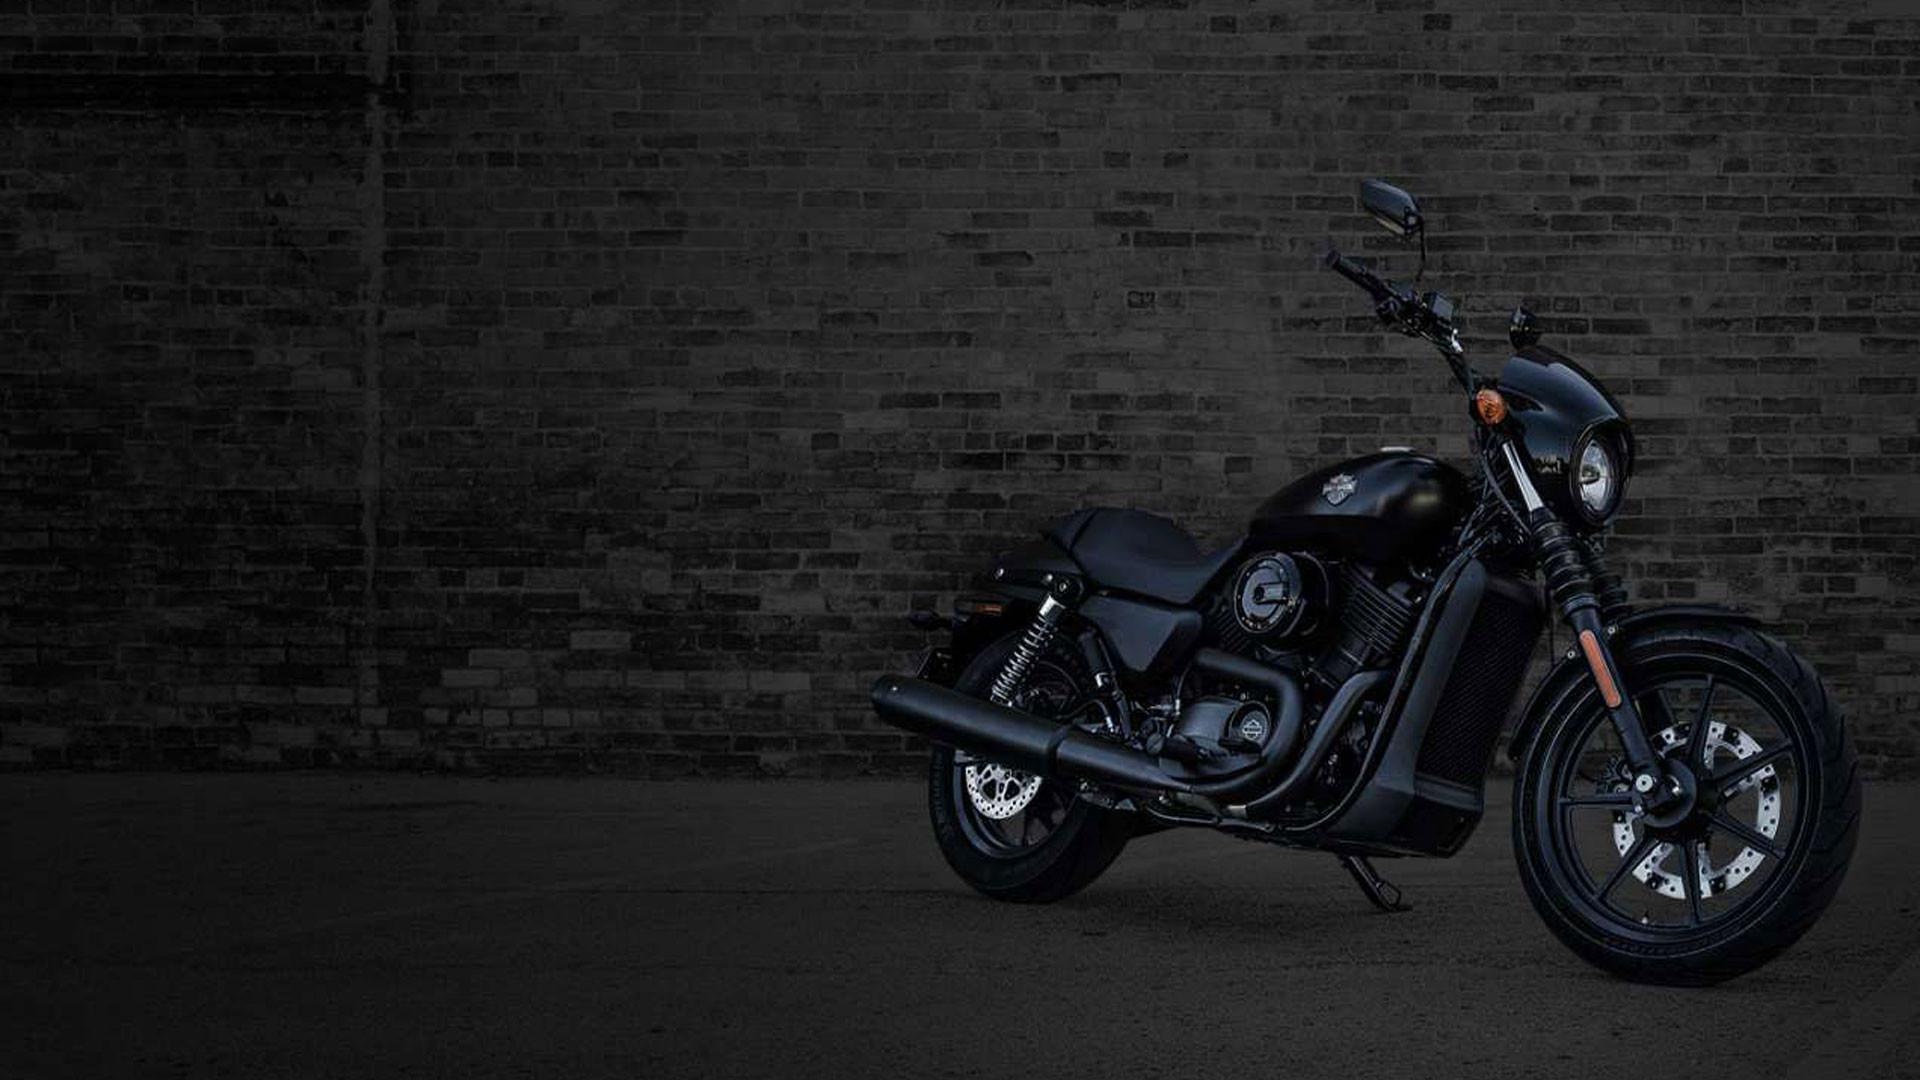 HD Harley Davidson Wallpapers (77+ Images